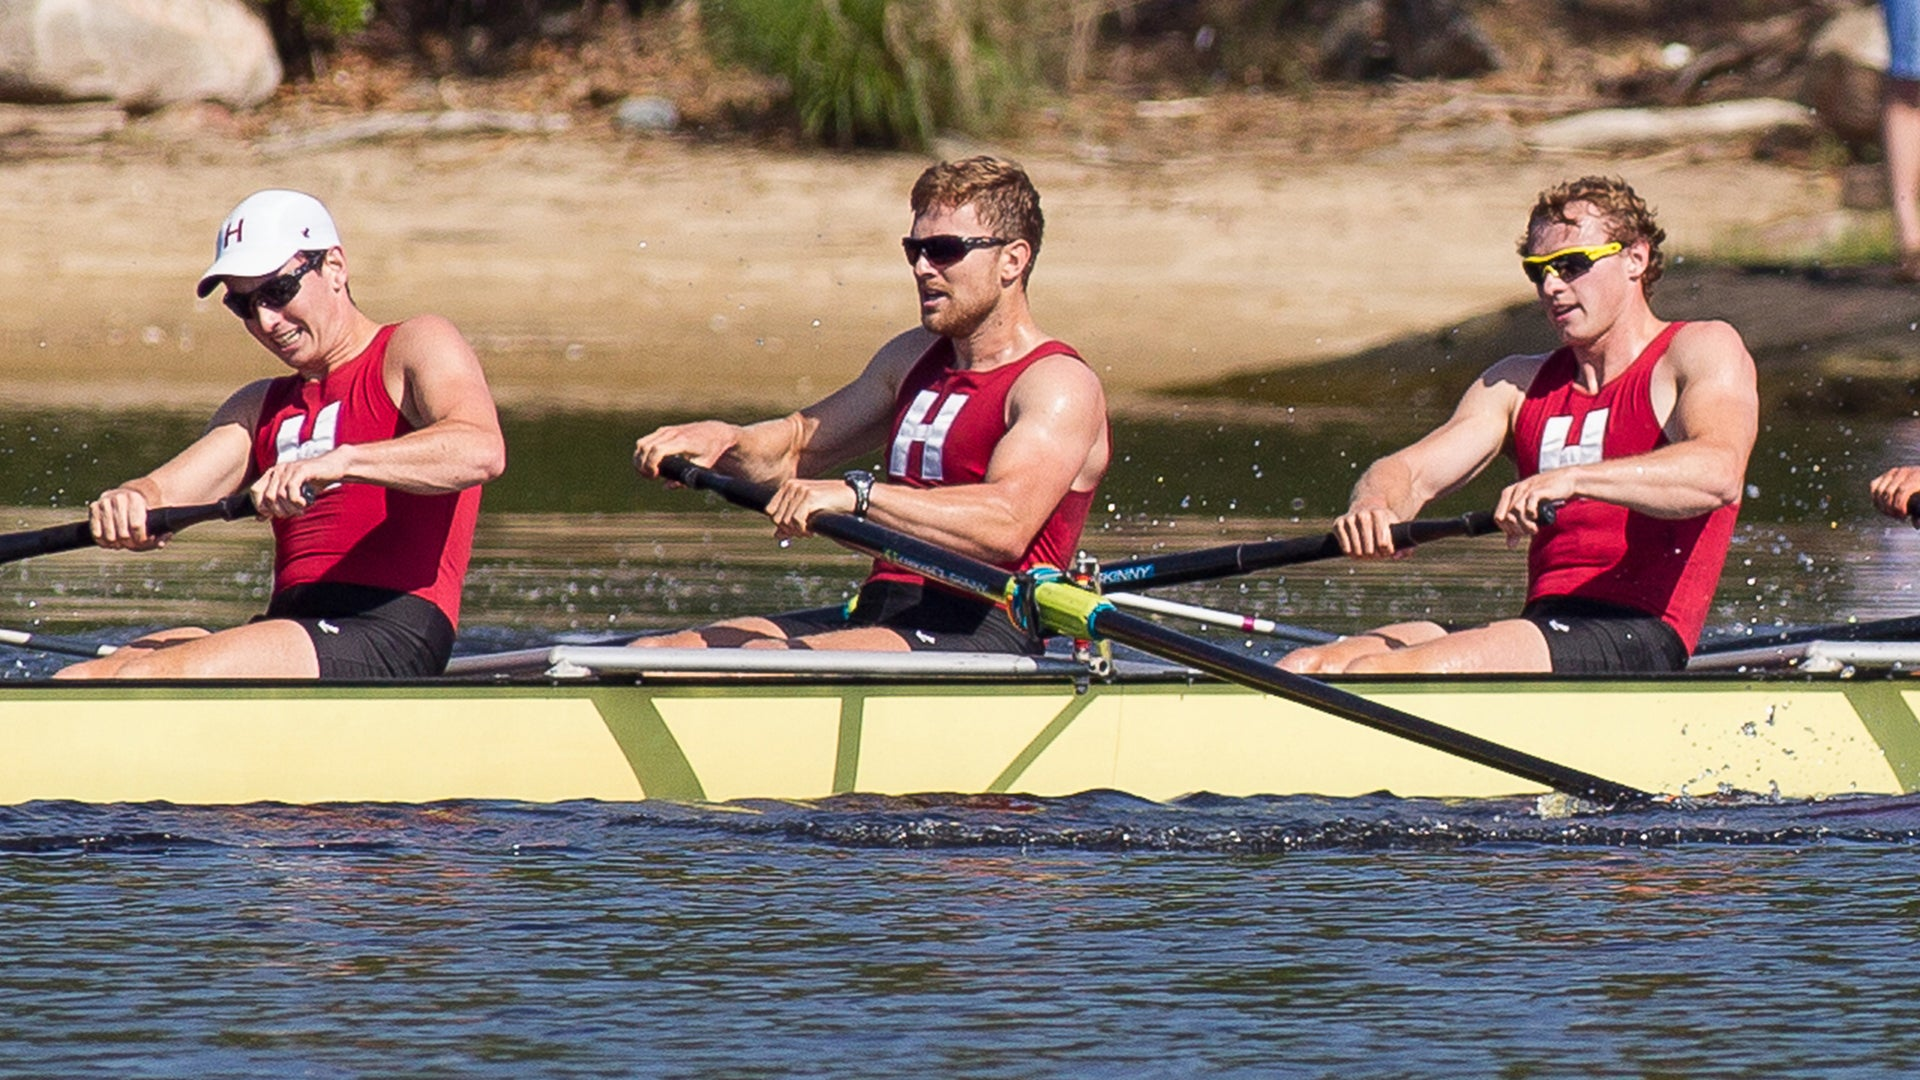 Harvard students rowing crew